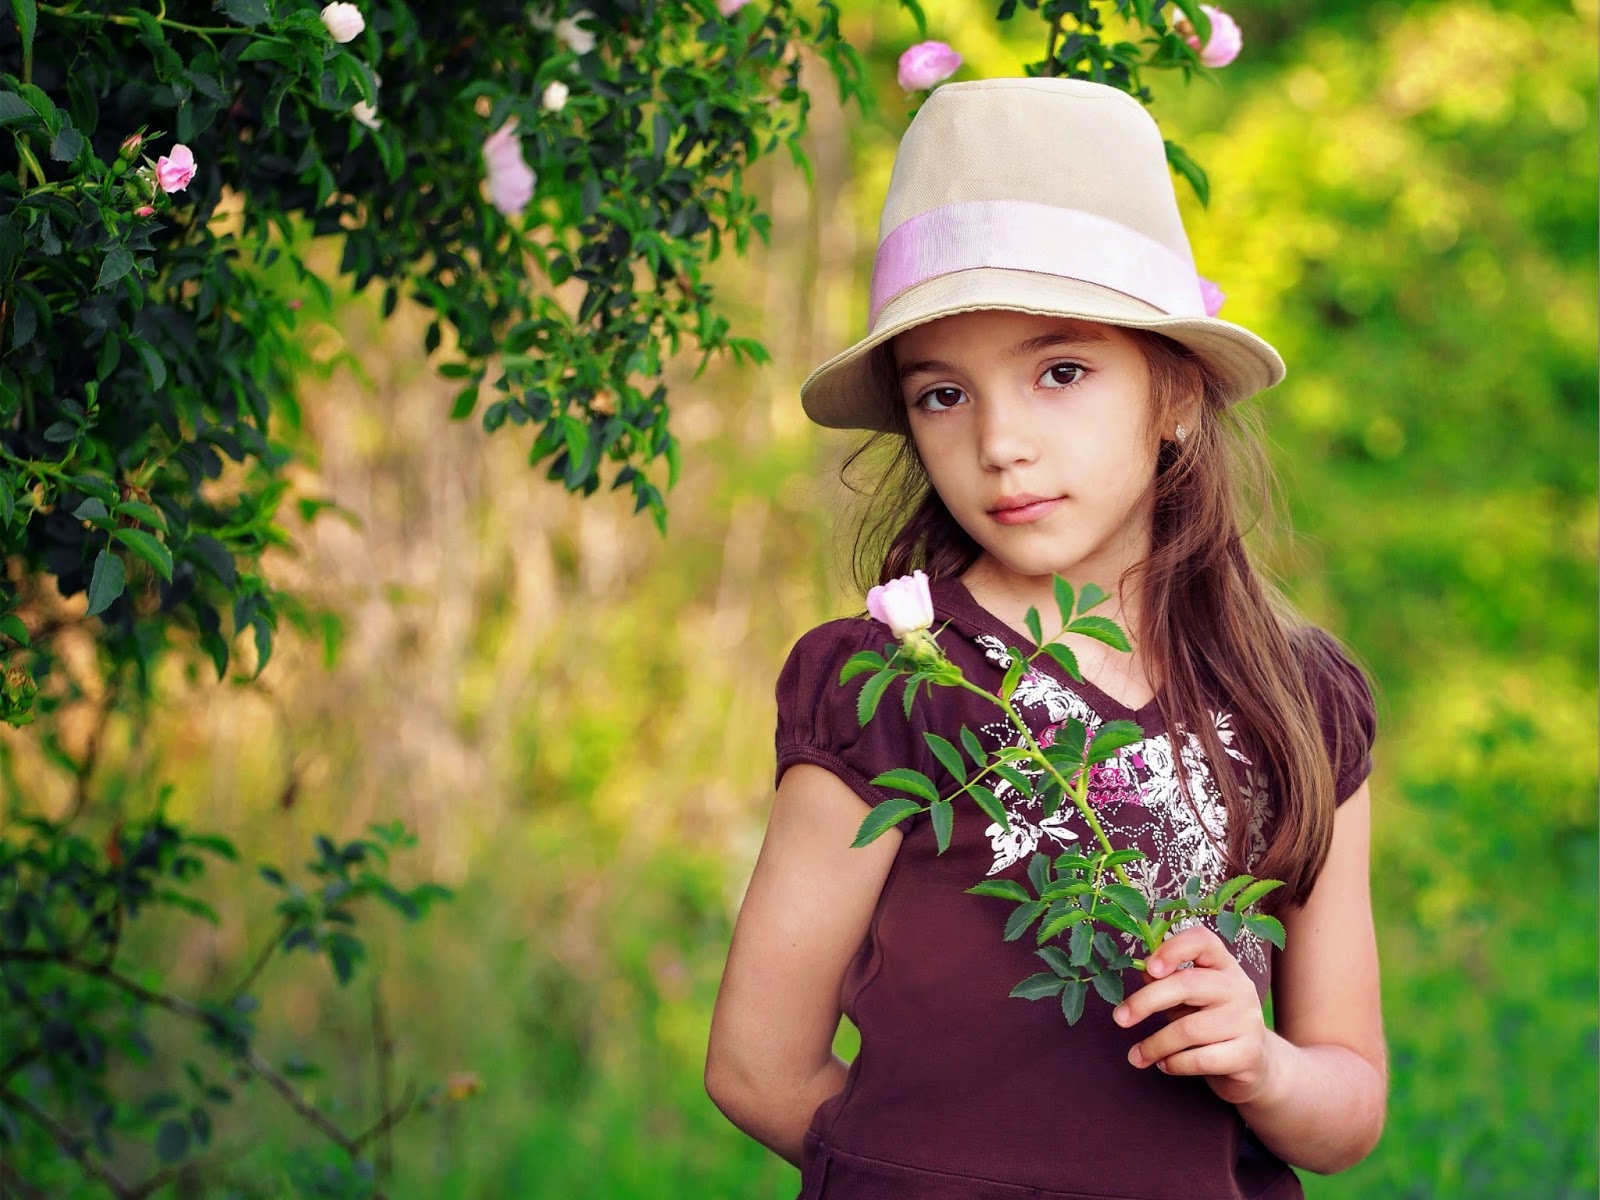 Gambar anak perempuan cantik pakai topi dan bunga